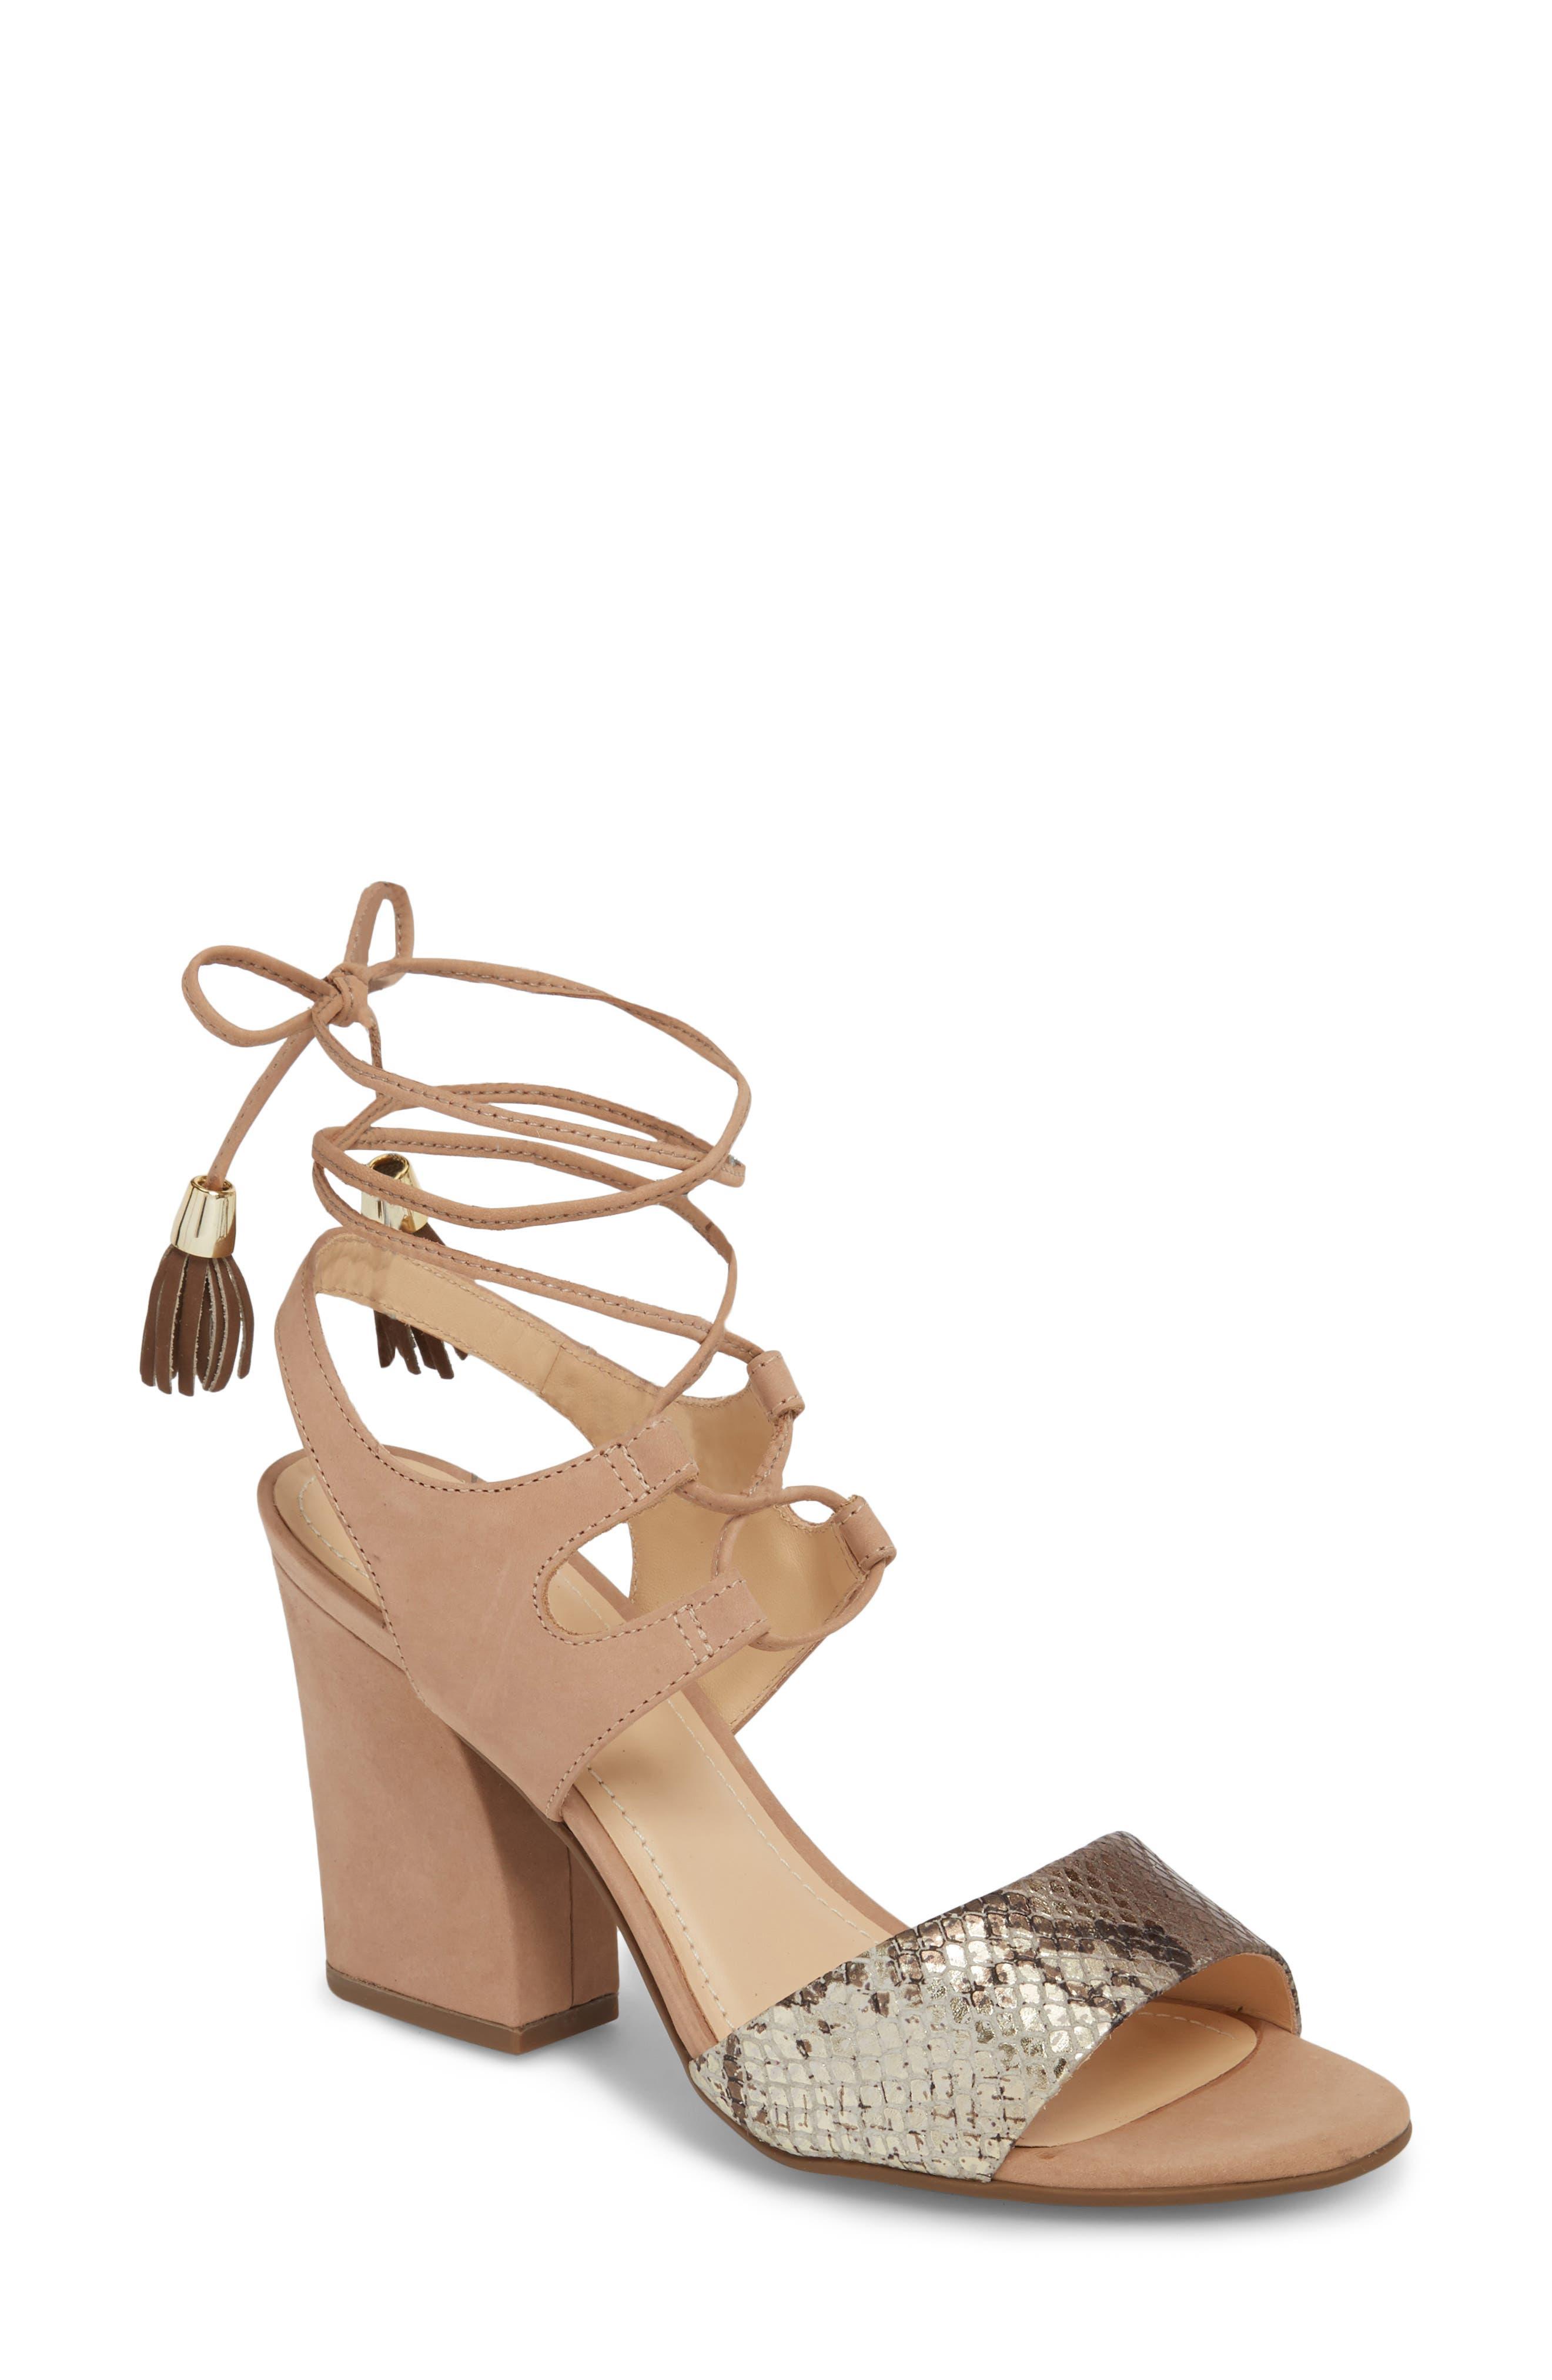 Kaira Ankle Wrap Sandal,                             Main thumbnail 1, color,                             SNAKE PRINT LEATHER